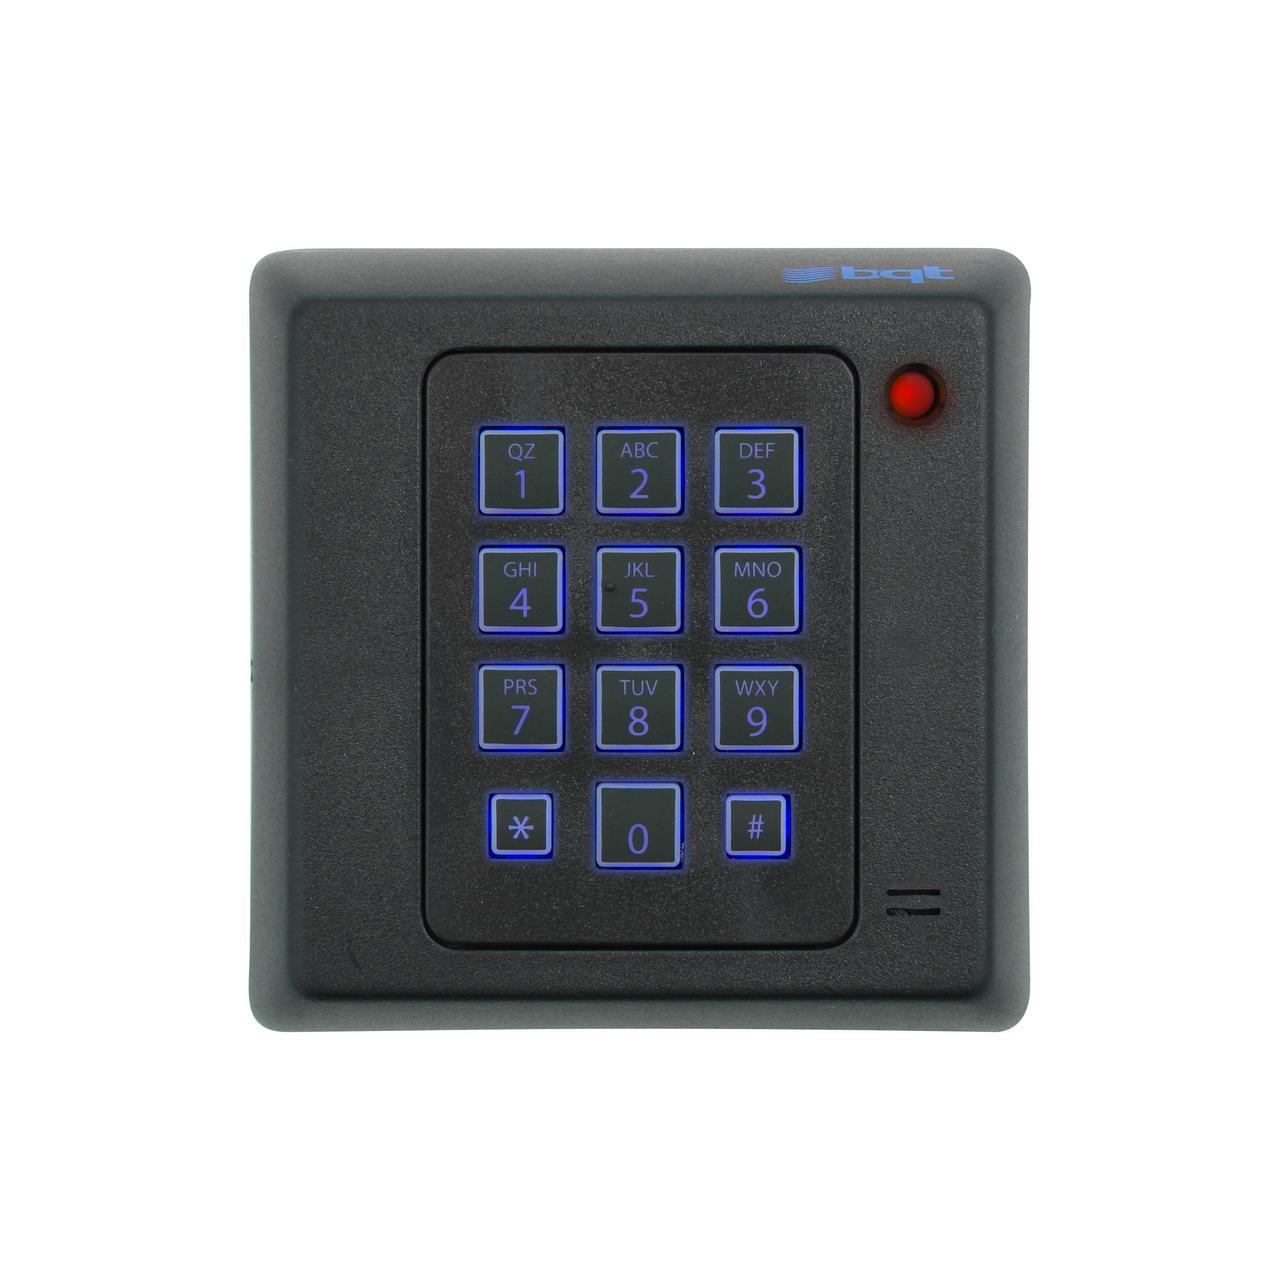 Card reader with PIN codes